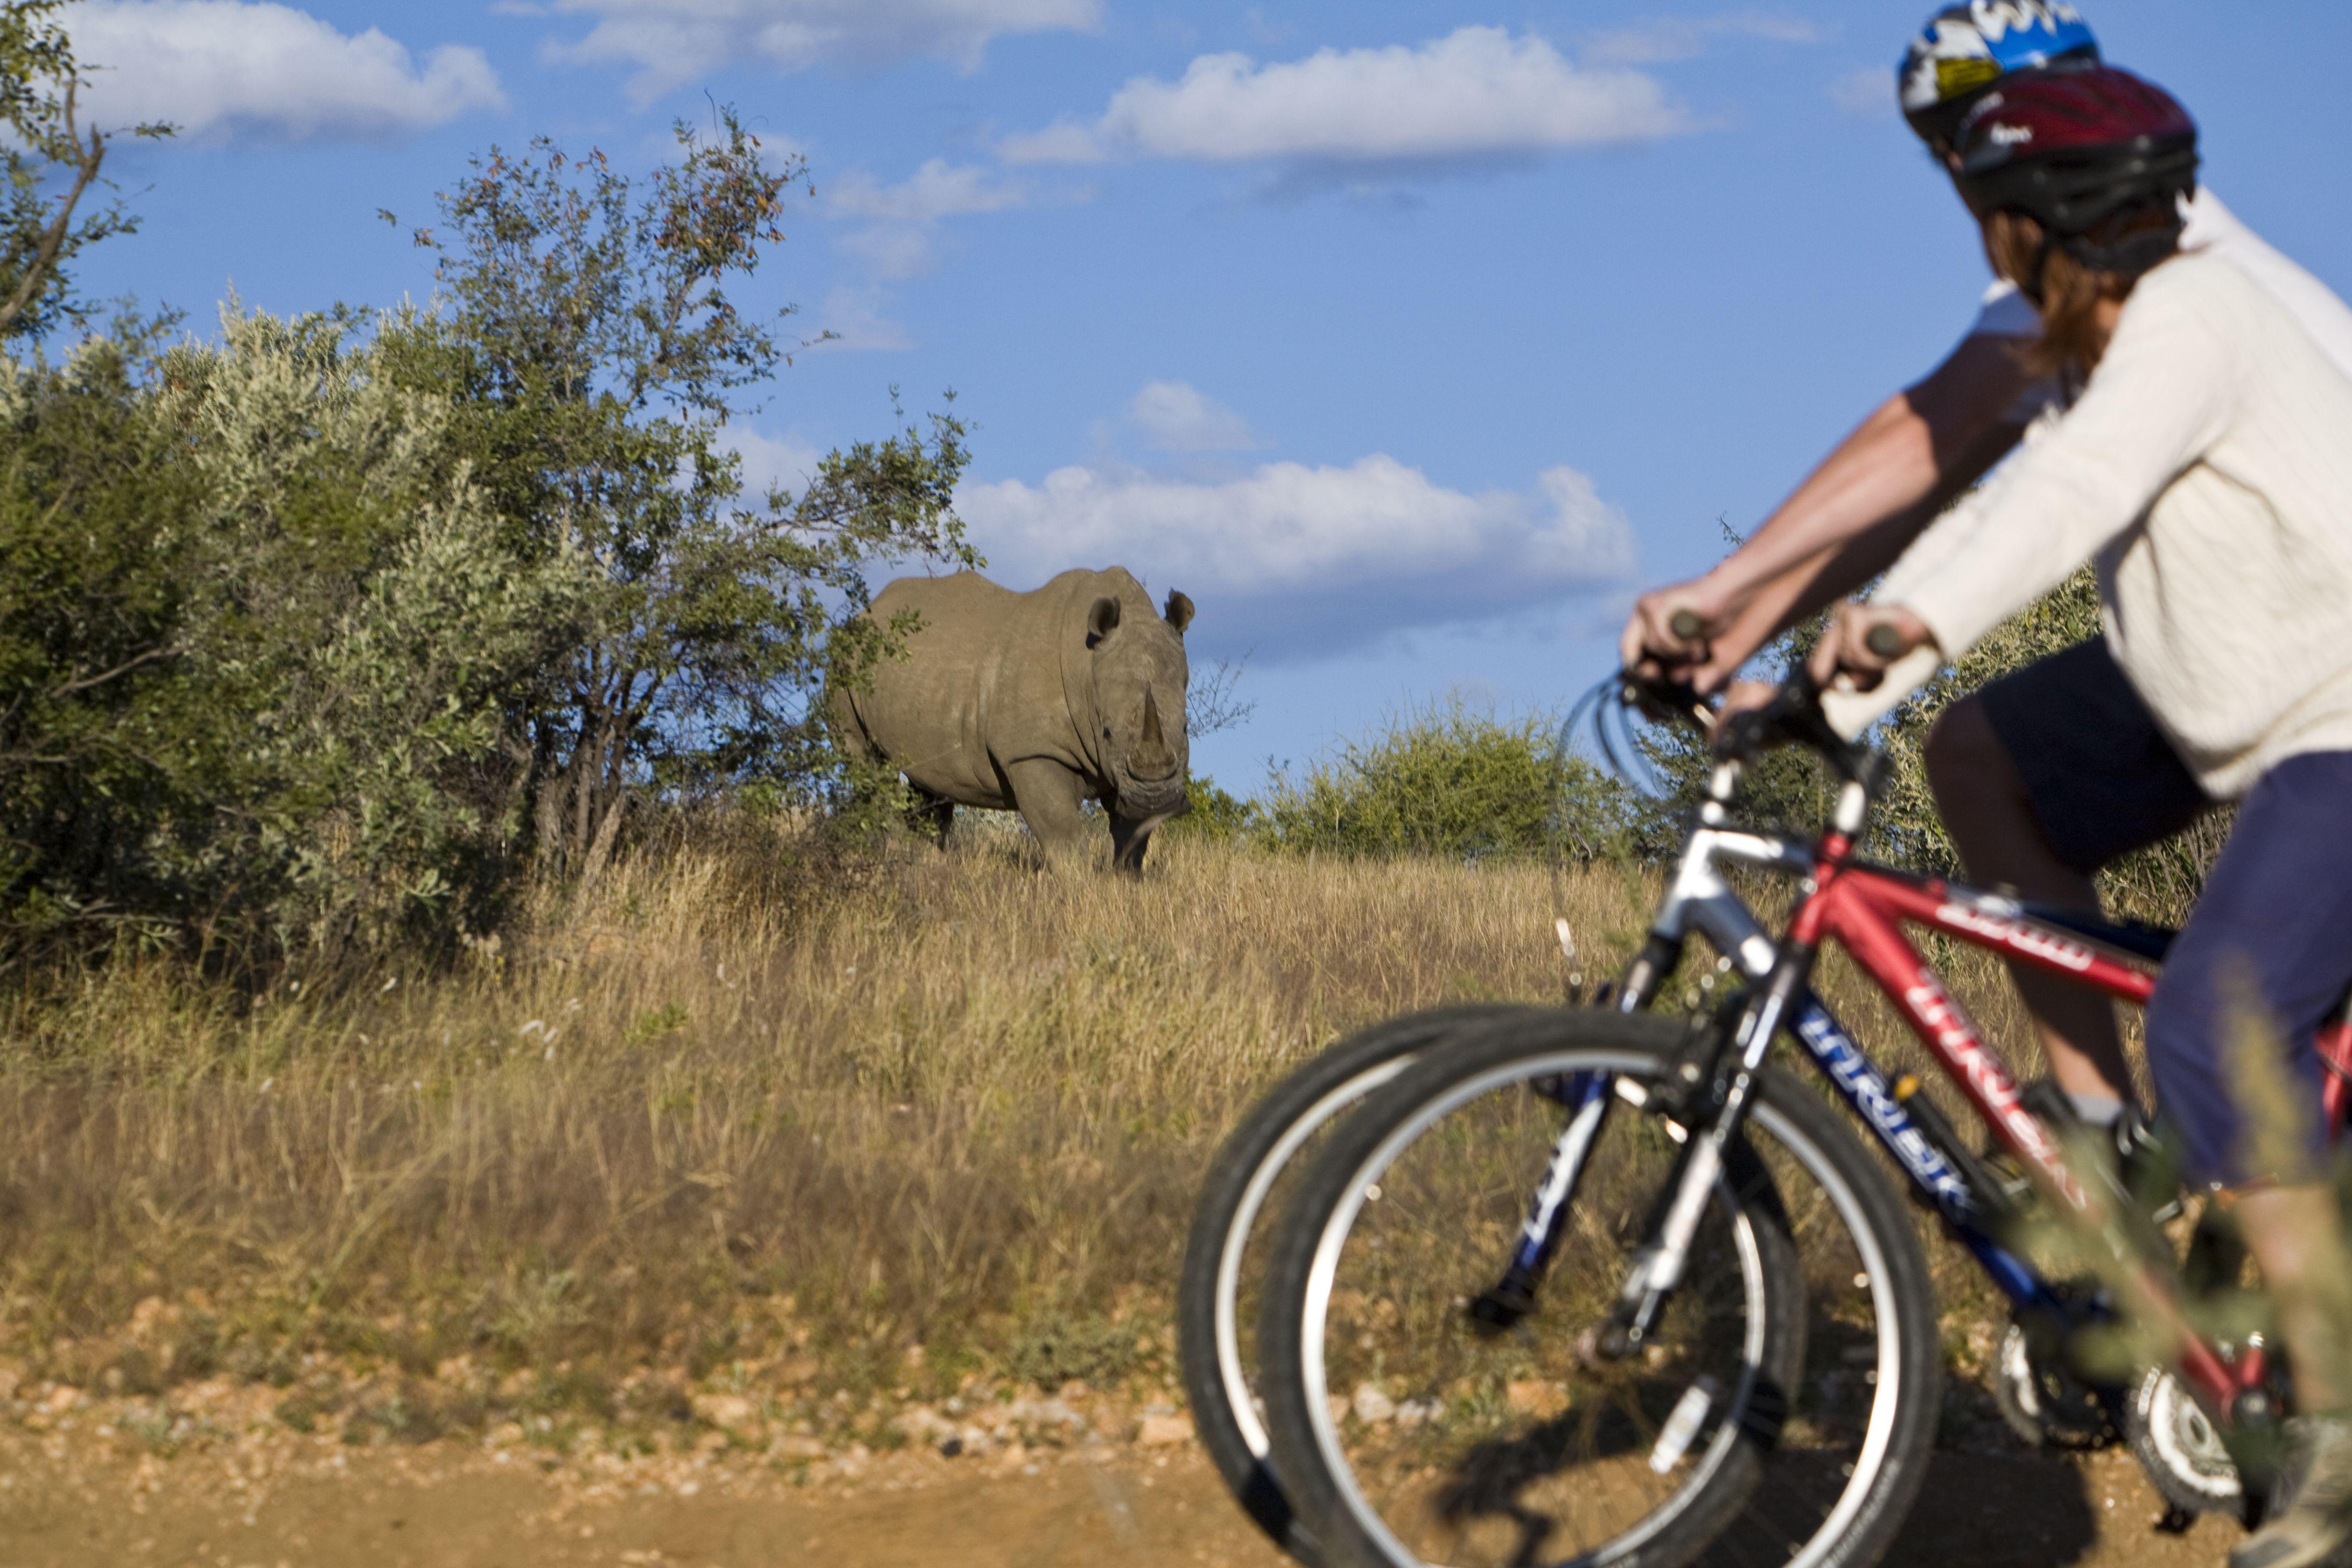 Mbweha Safari Camp Kenya Go On Guided Walks Horse Riding